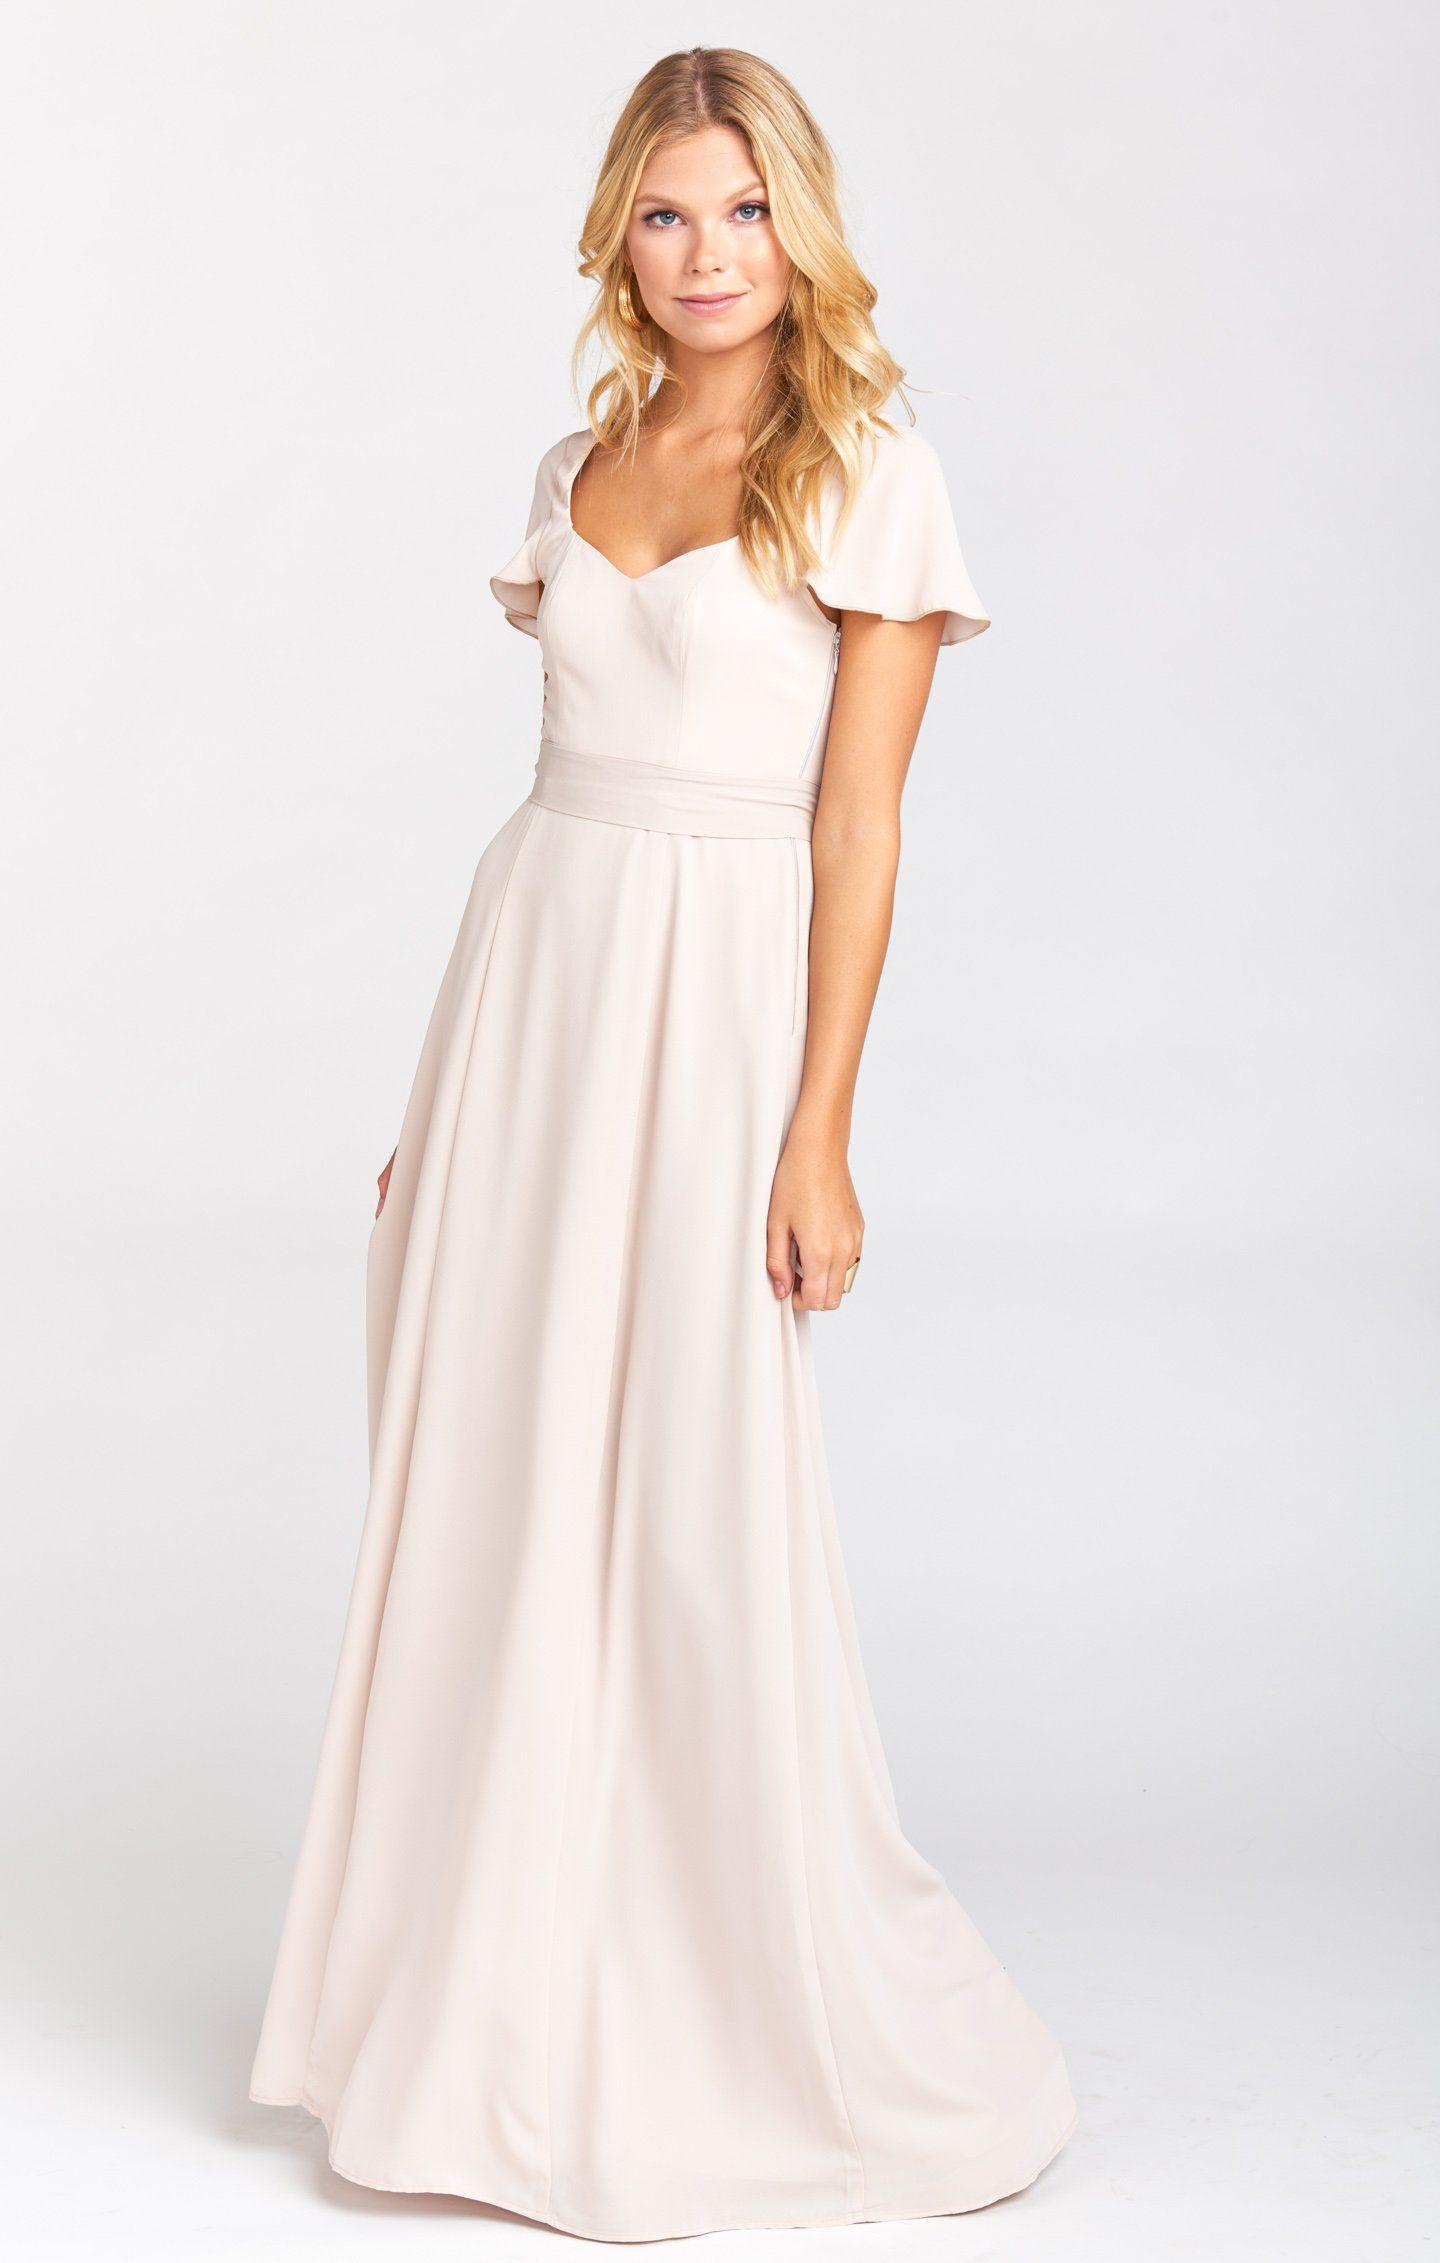 Marie Sweetheart Maxi Dress Show Me The Ring Crisp Neutral Bridesmaid Dresses Bridesmaid Dresses Dresses [ 2263 x 1440 Pixel ]